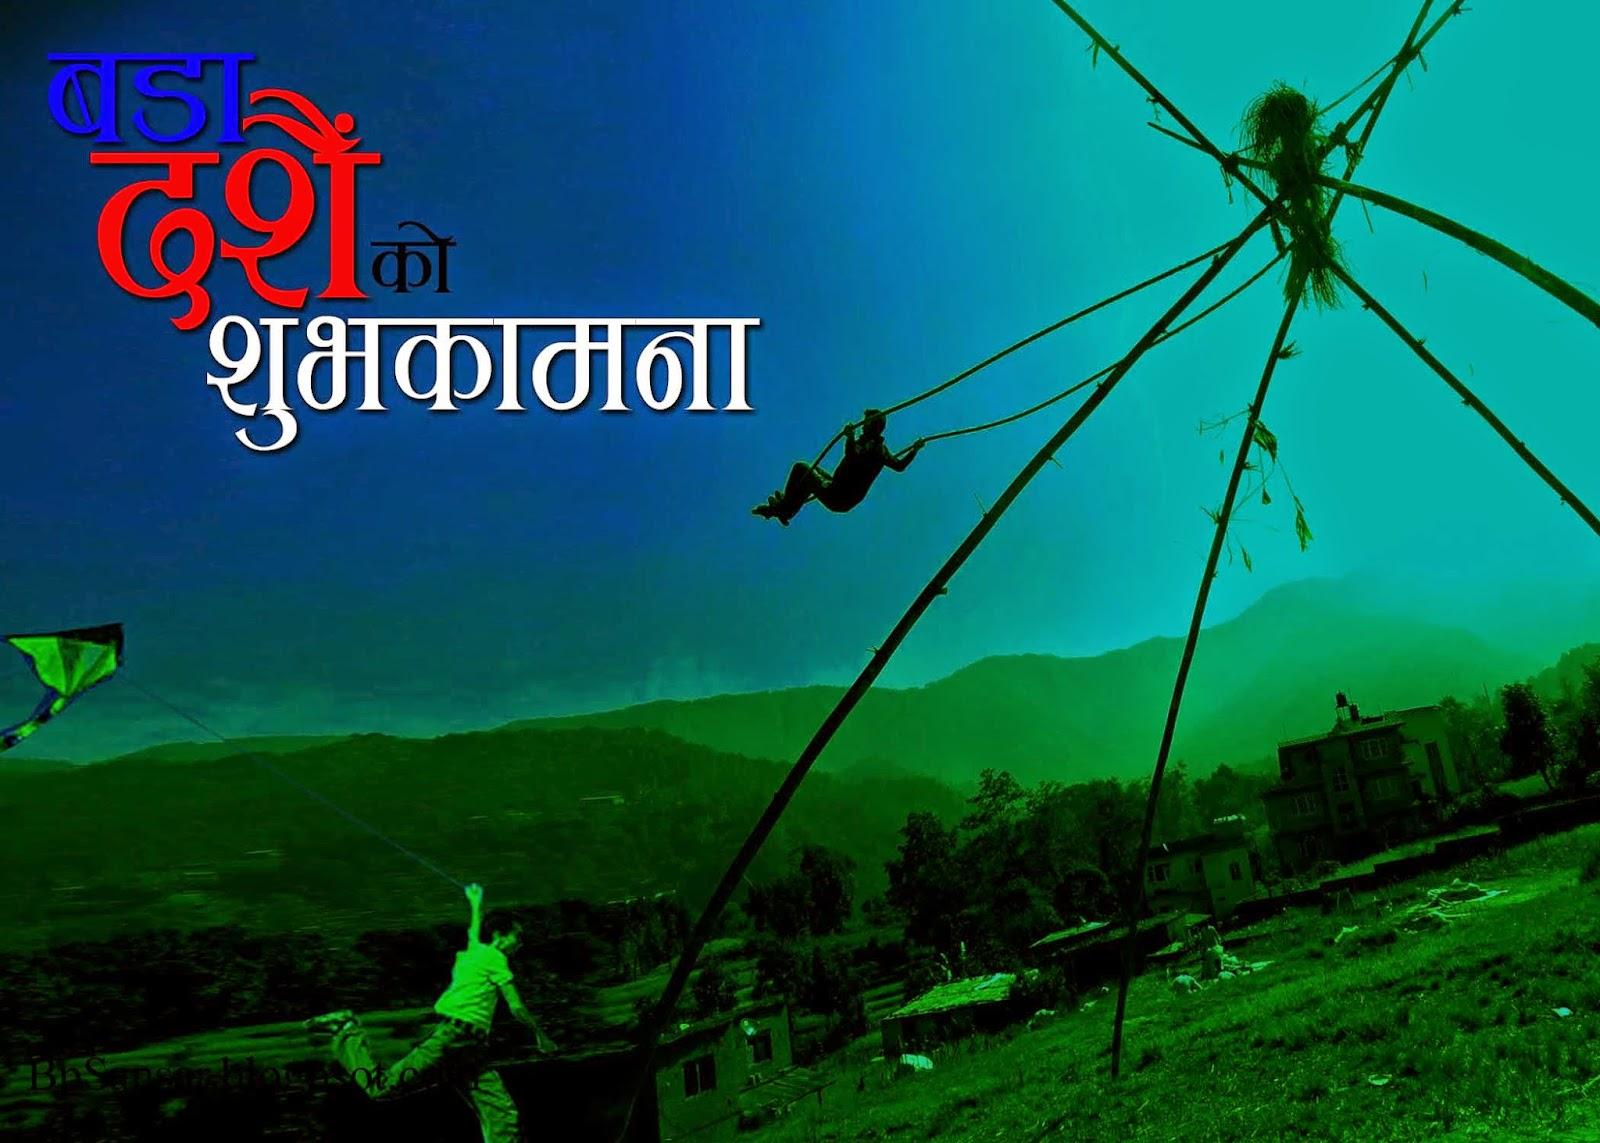 Happy durga puja 2014 greeting card in nepali m4hsunfo